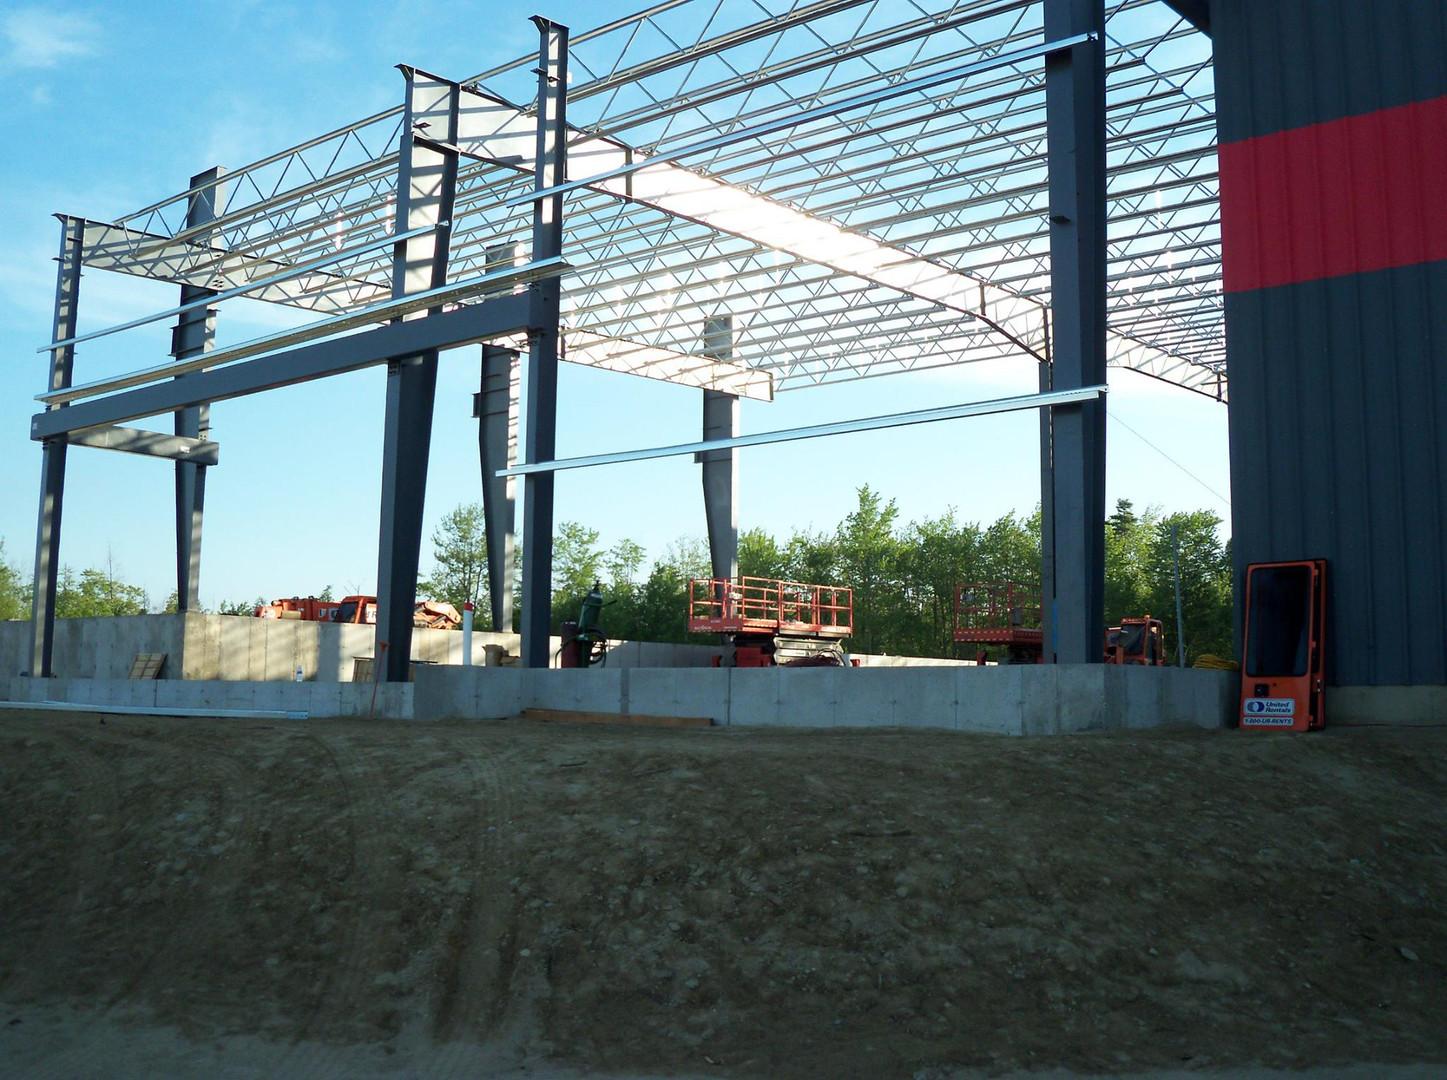 FW Webb S Portland Progress